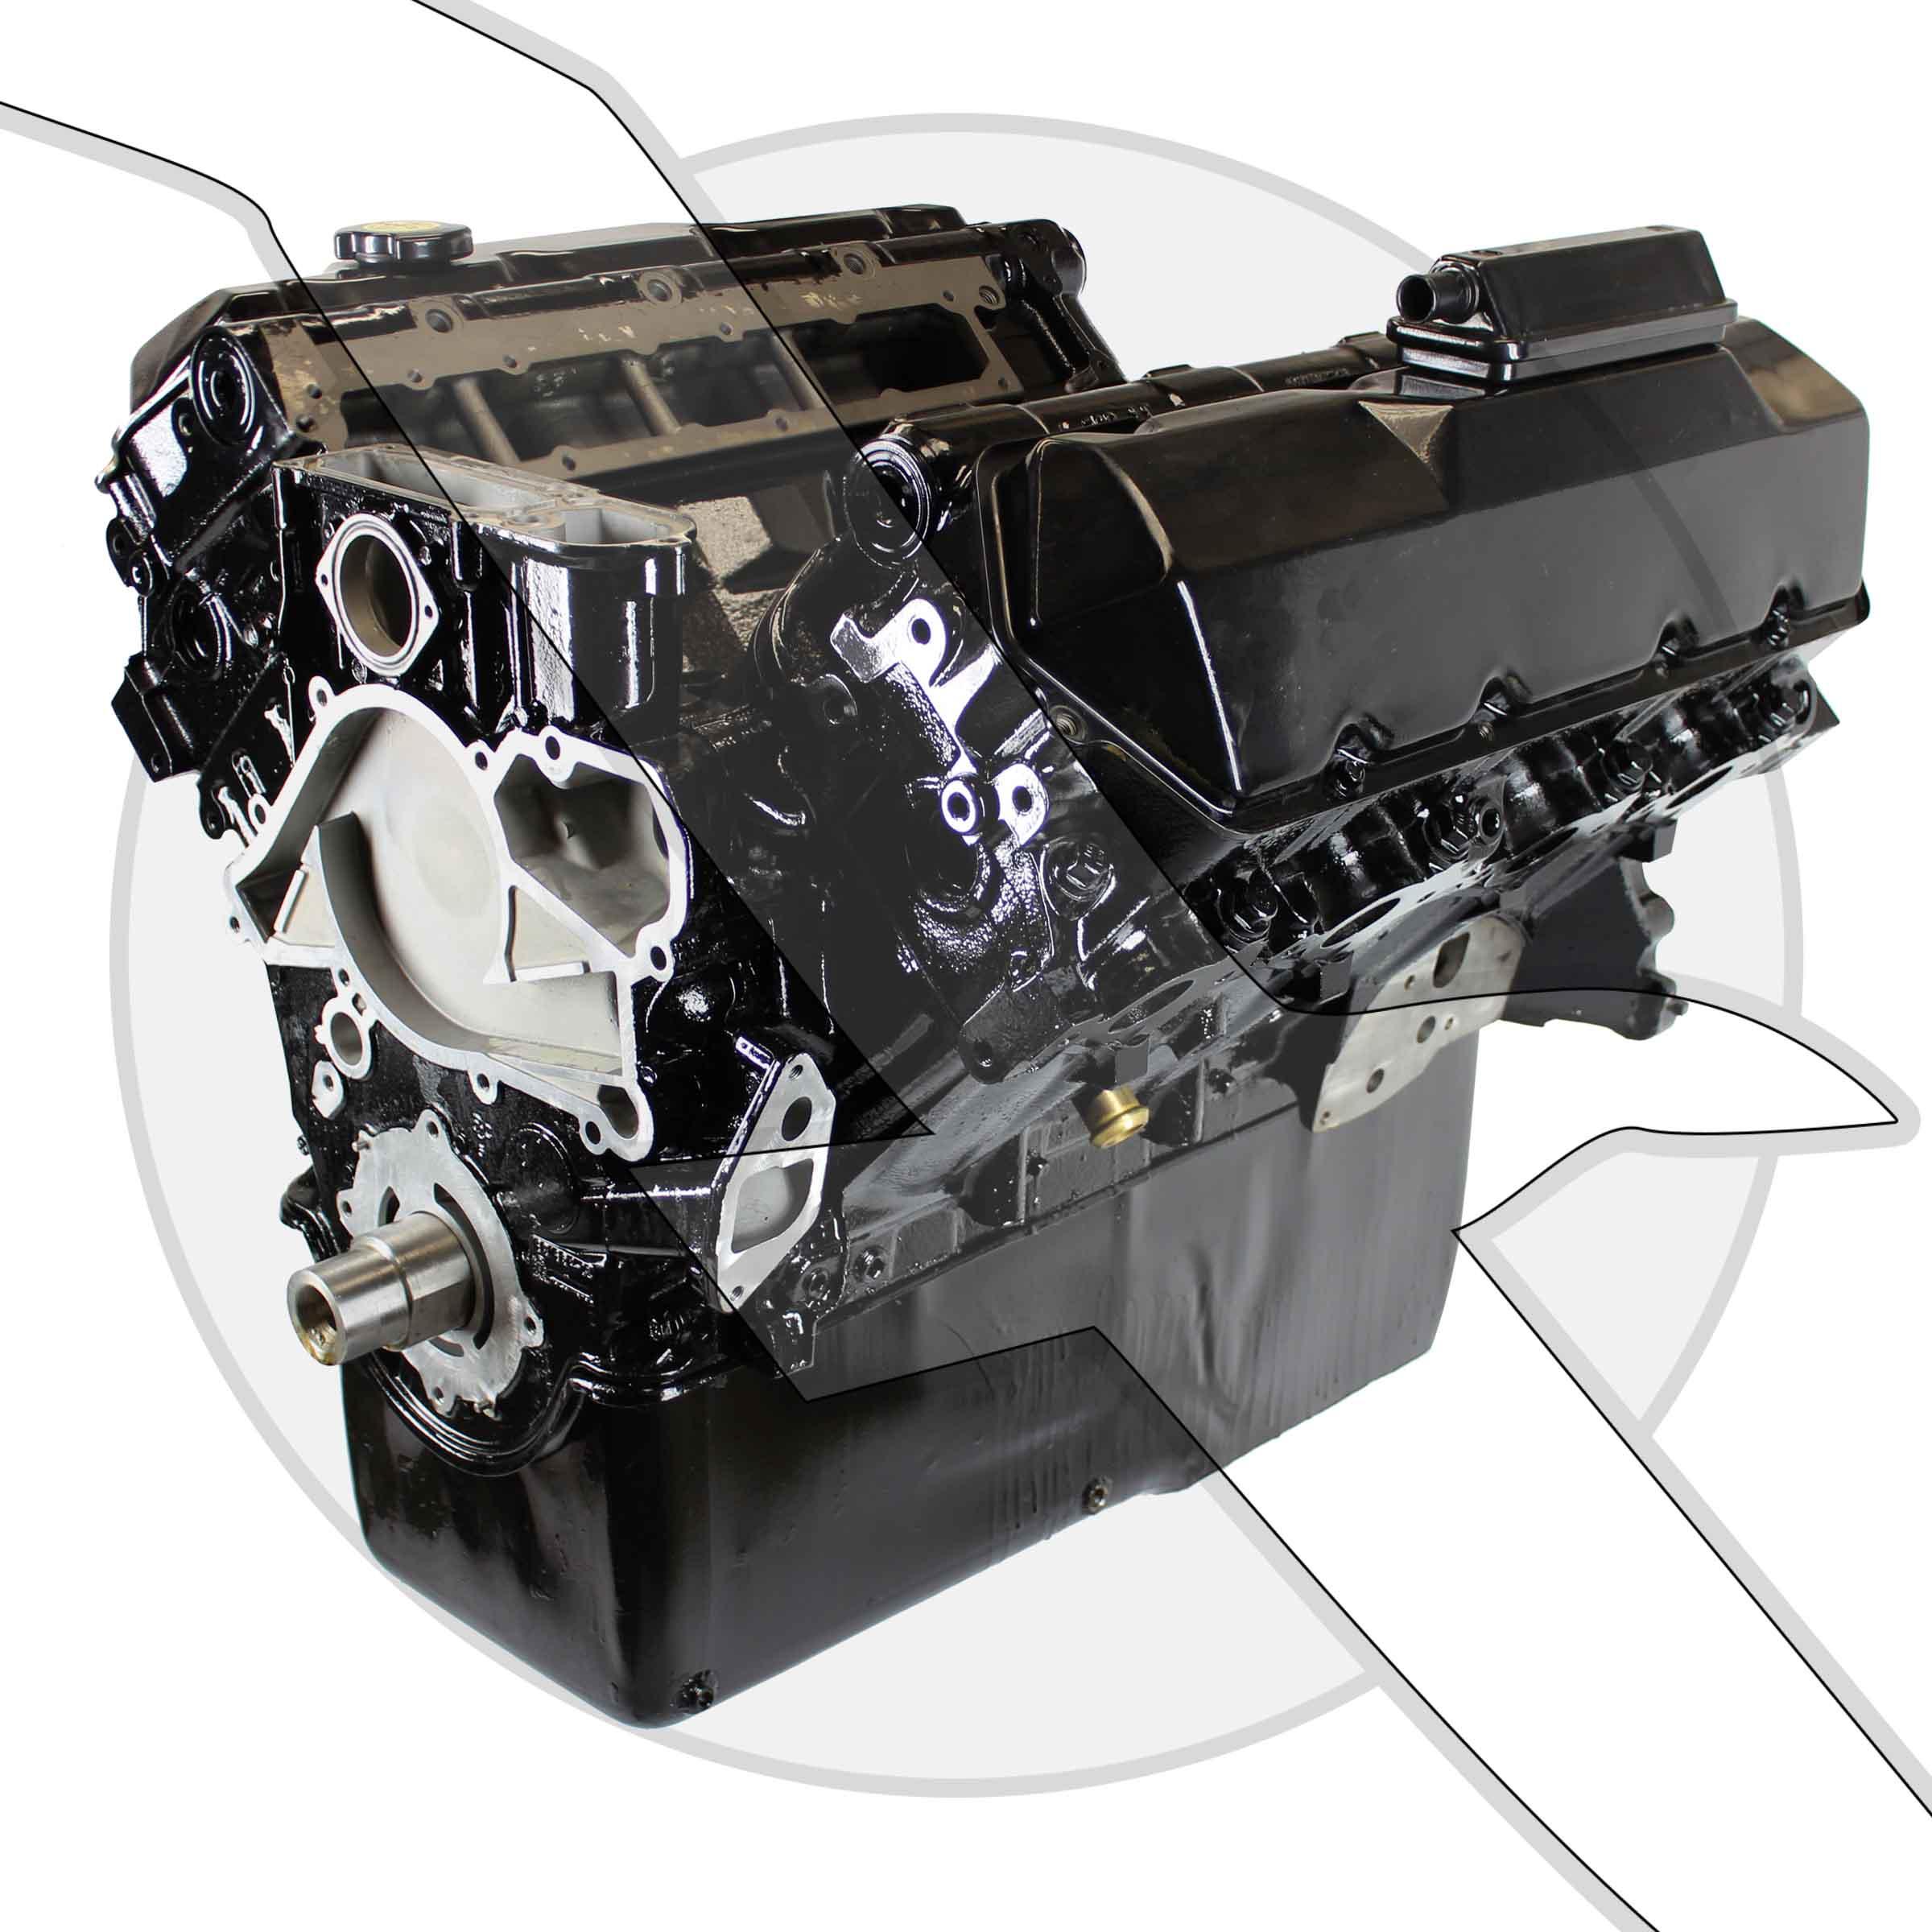 Details about Mercruiser 7 3L Diesel D-Tronic Reman Marine Long Block Boat  Engine 300hp